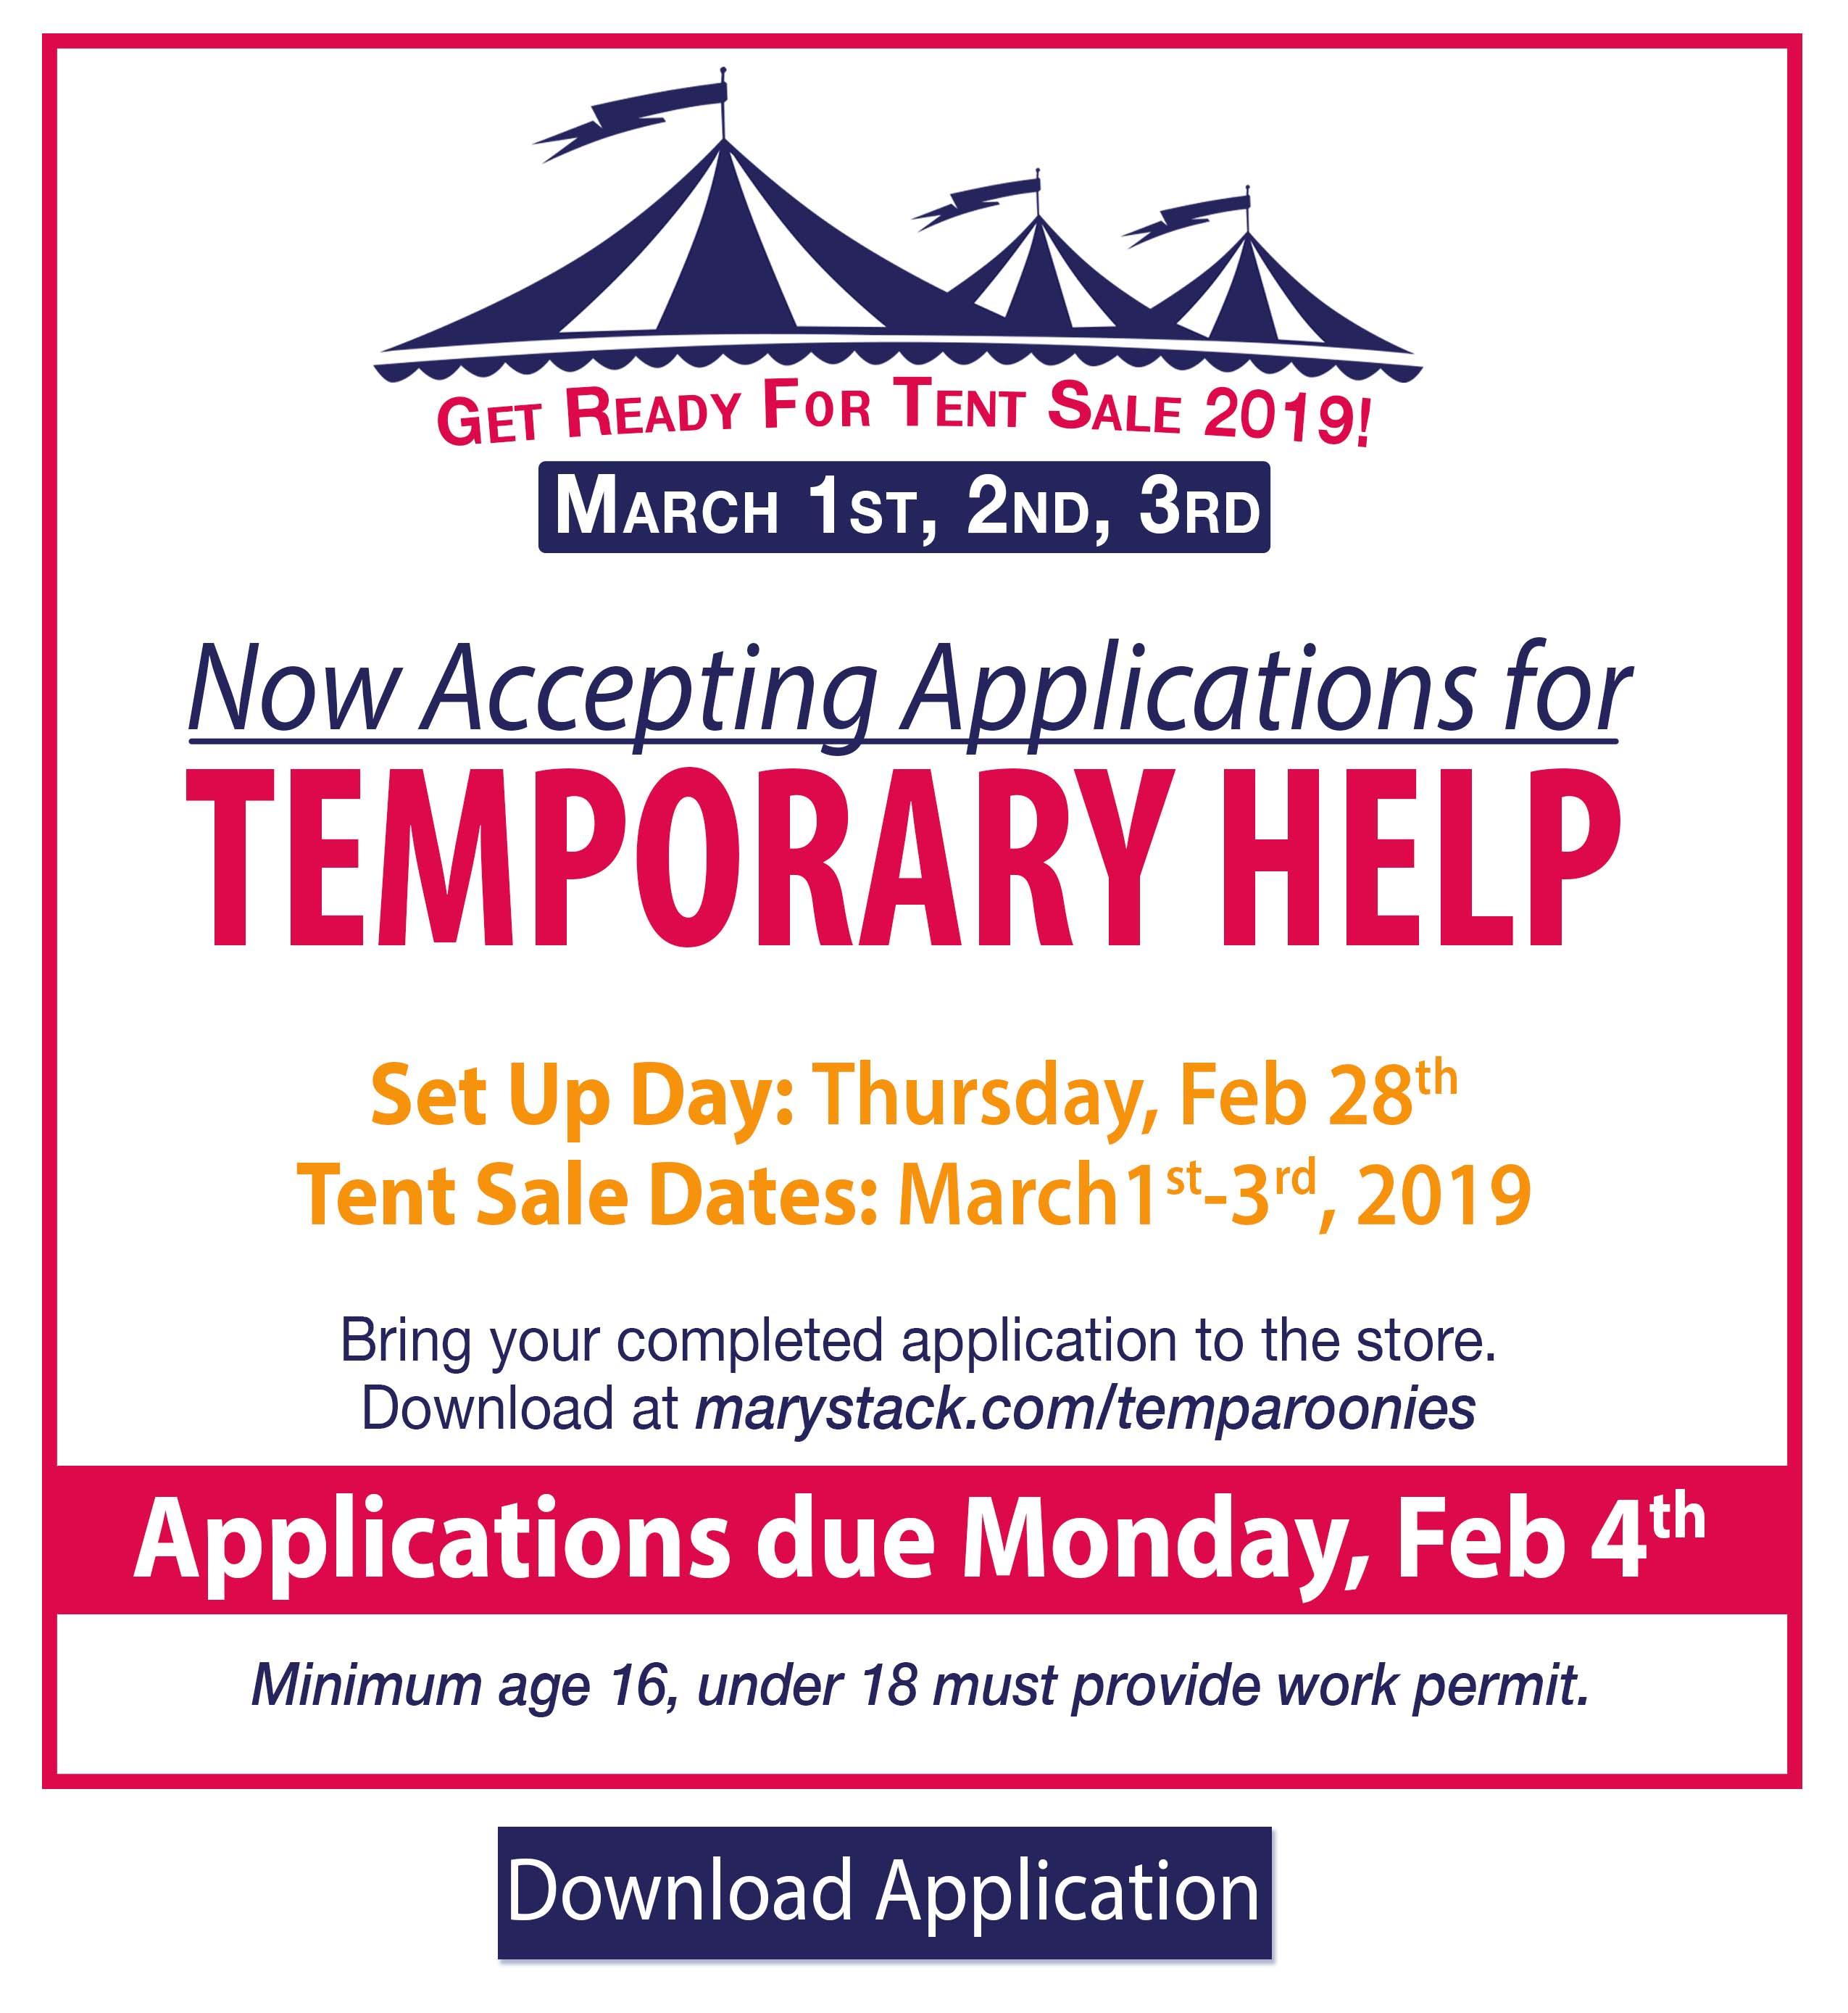 Temp Recruit Tent Sale Applications